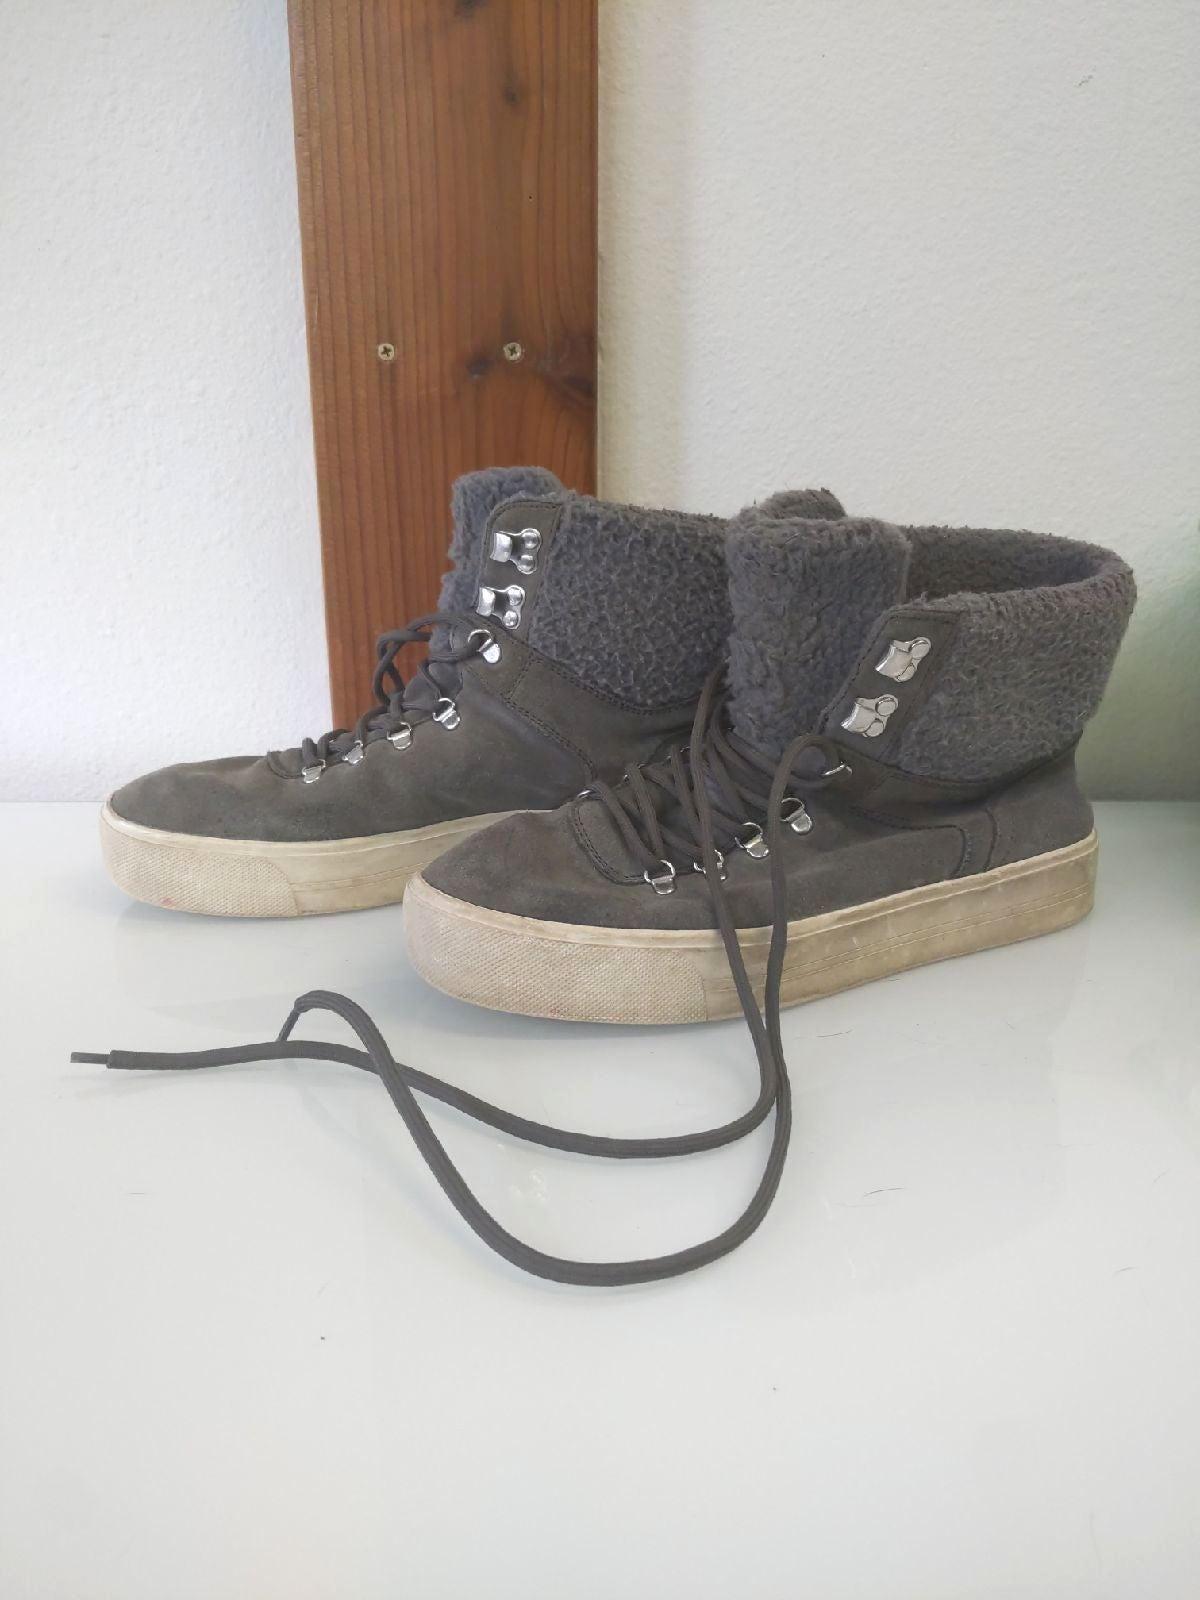 NWOB Marc Fisher MF Darlen Suede Leather Faux Fur Hi Top Sneakers